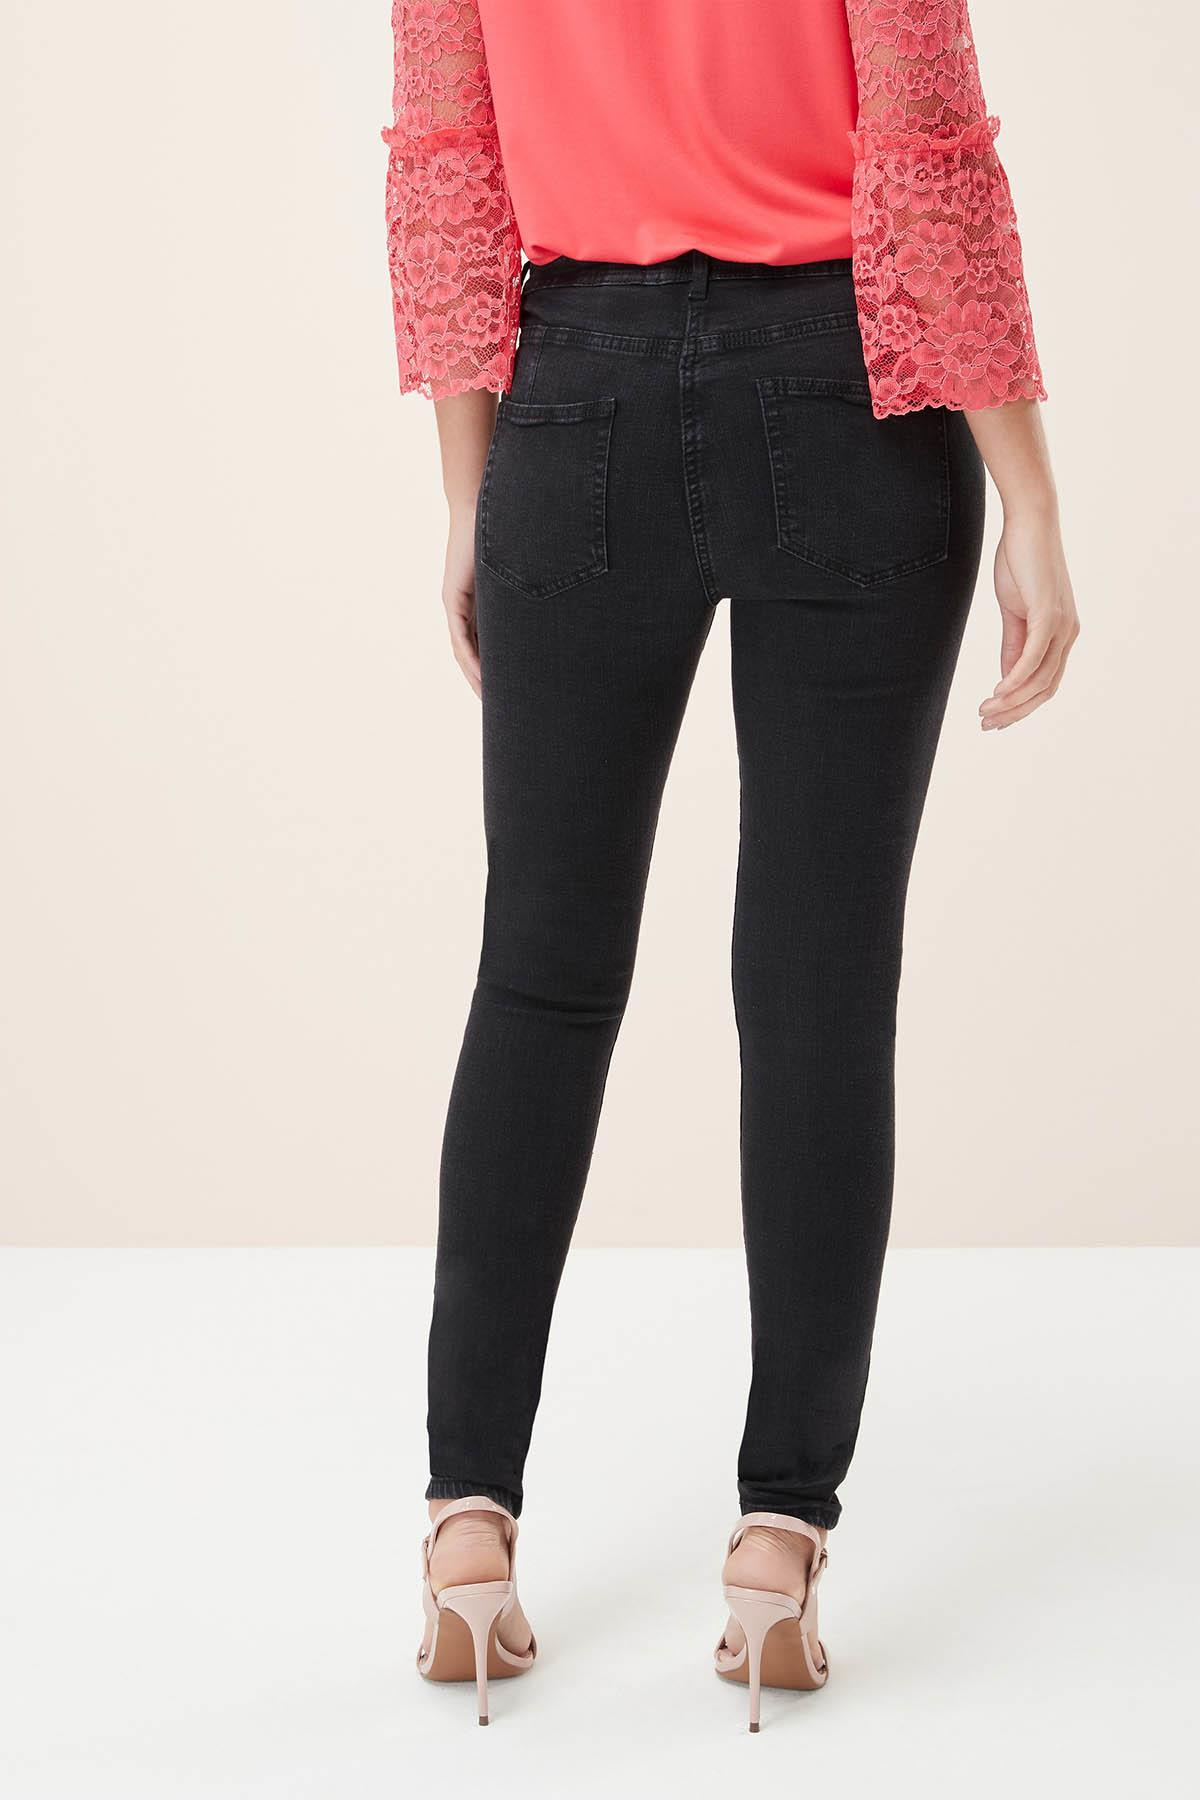 Ladies-Skinny-Jeans-New-ex-Next-Extra-Stretch-Size-6-18-Short-Reg-X-Long-Tall thumbnail 11